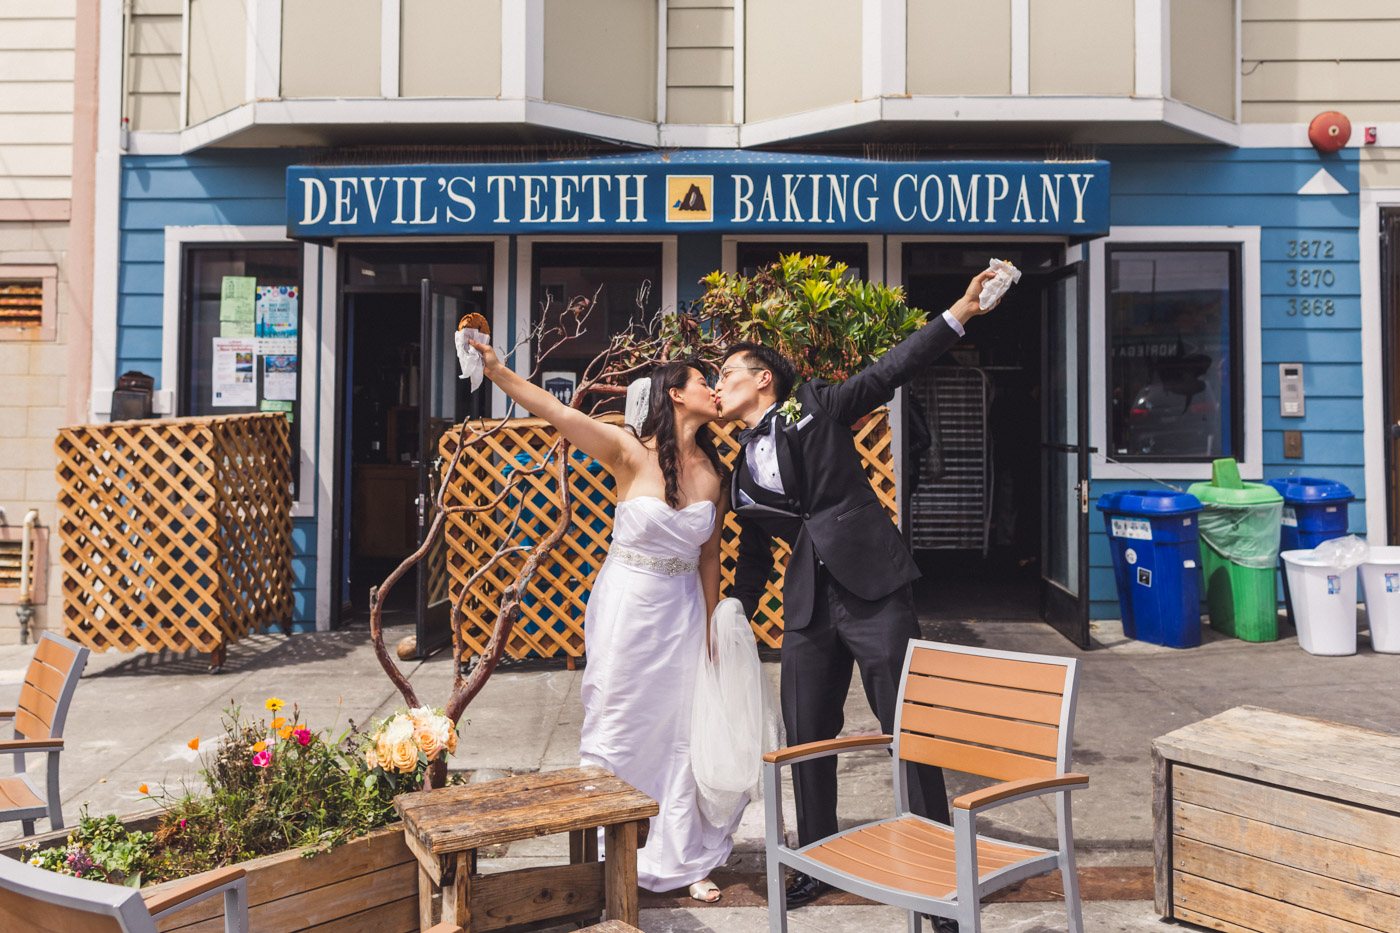 devils-teeth-baking-company-sf-wedding-portraits